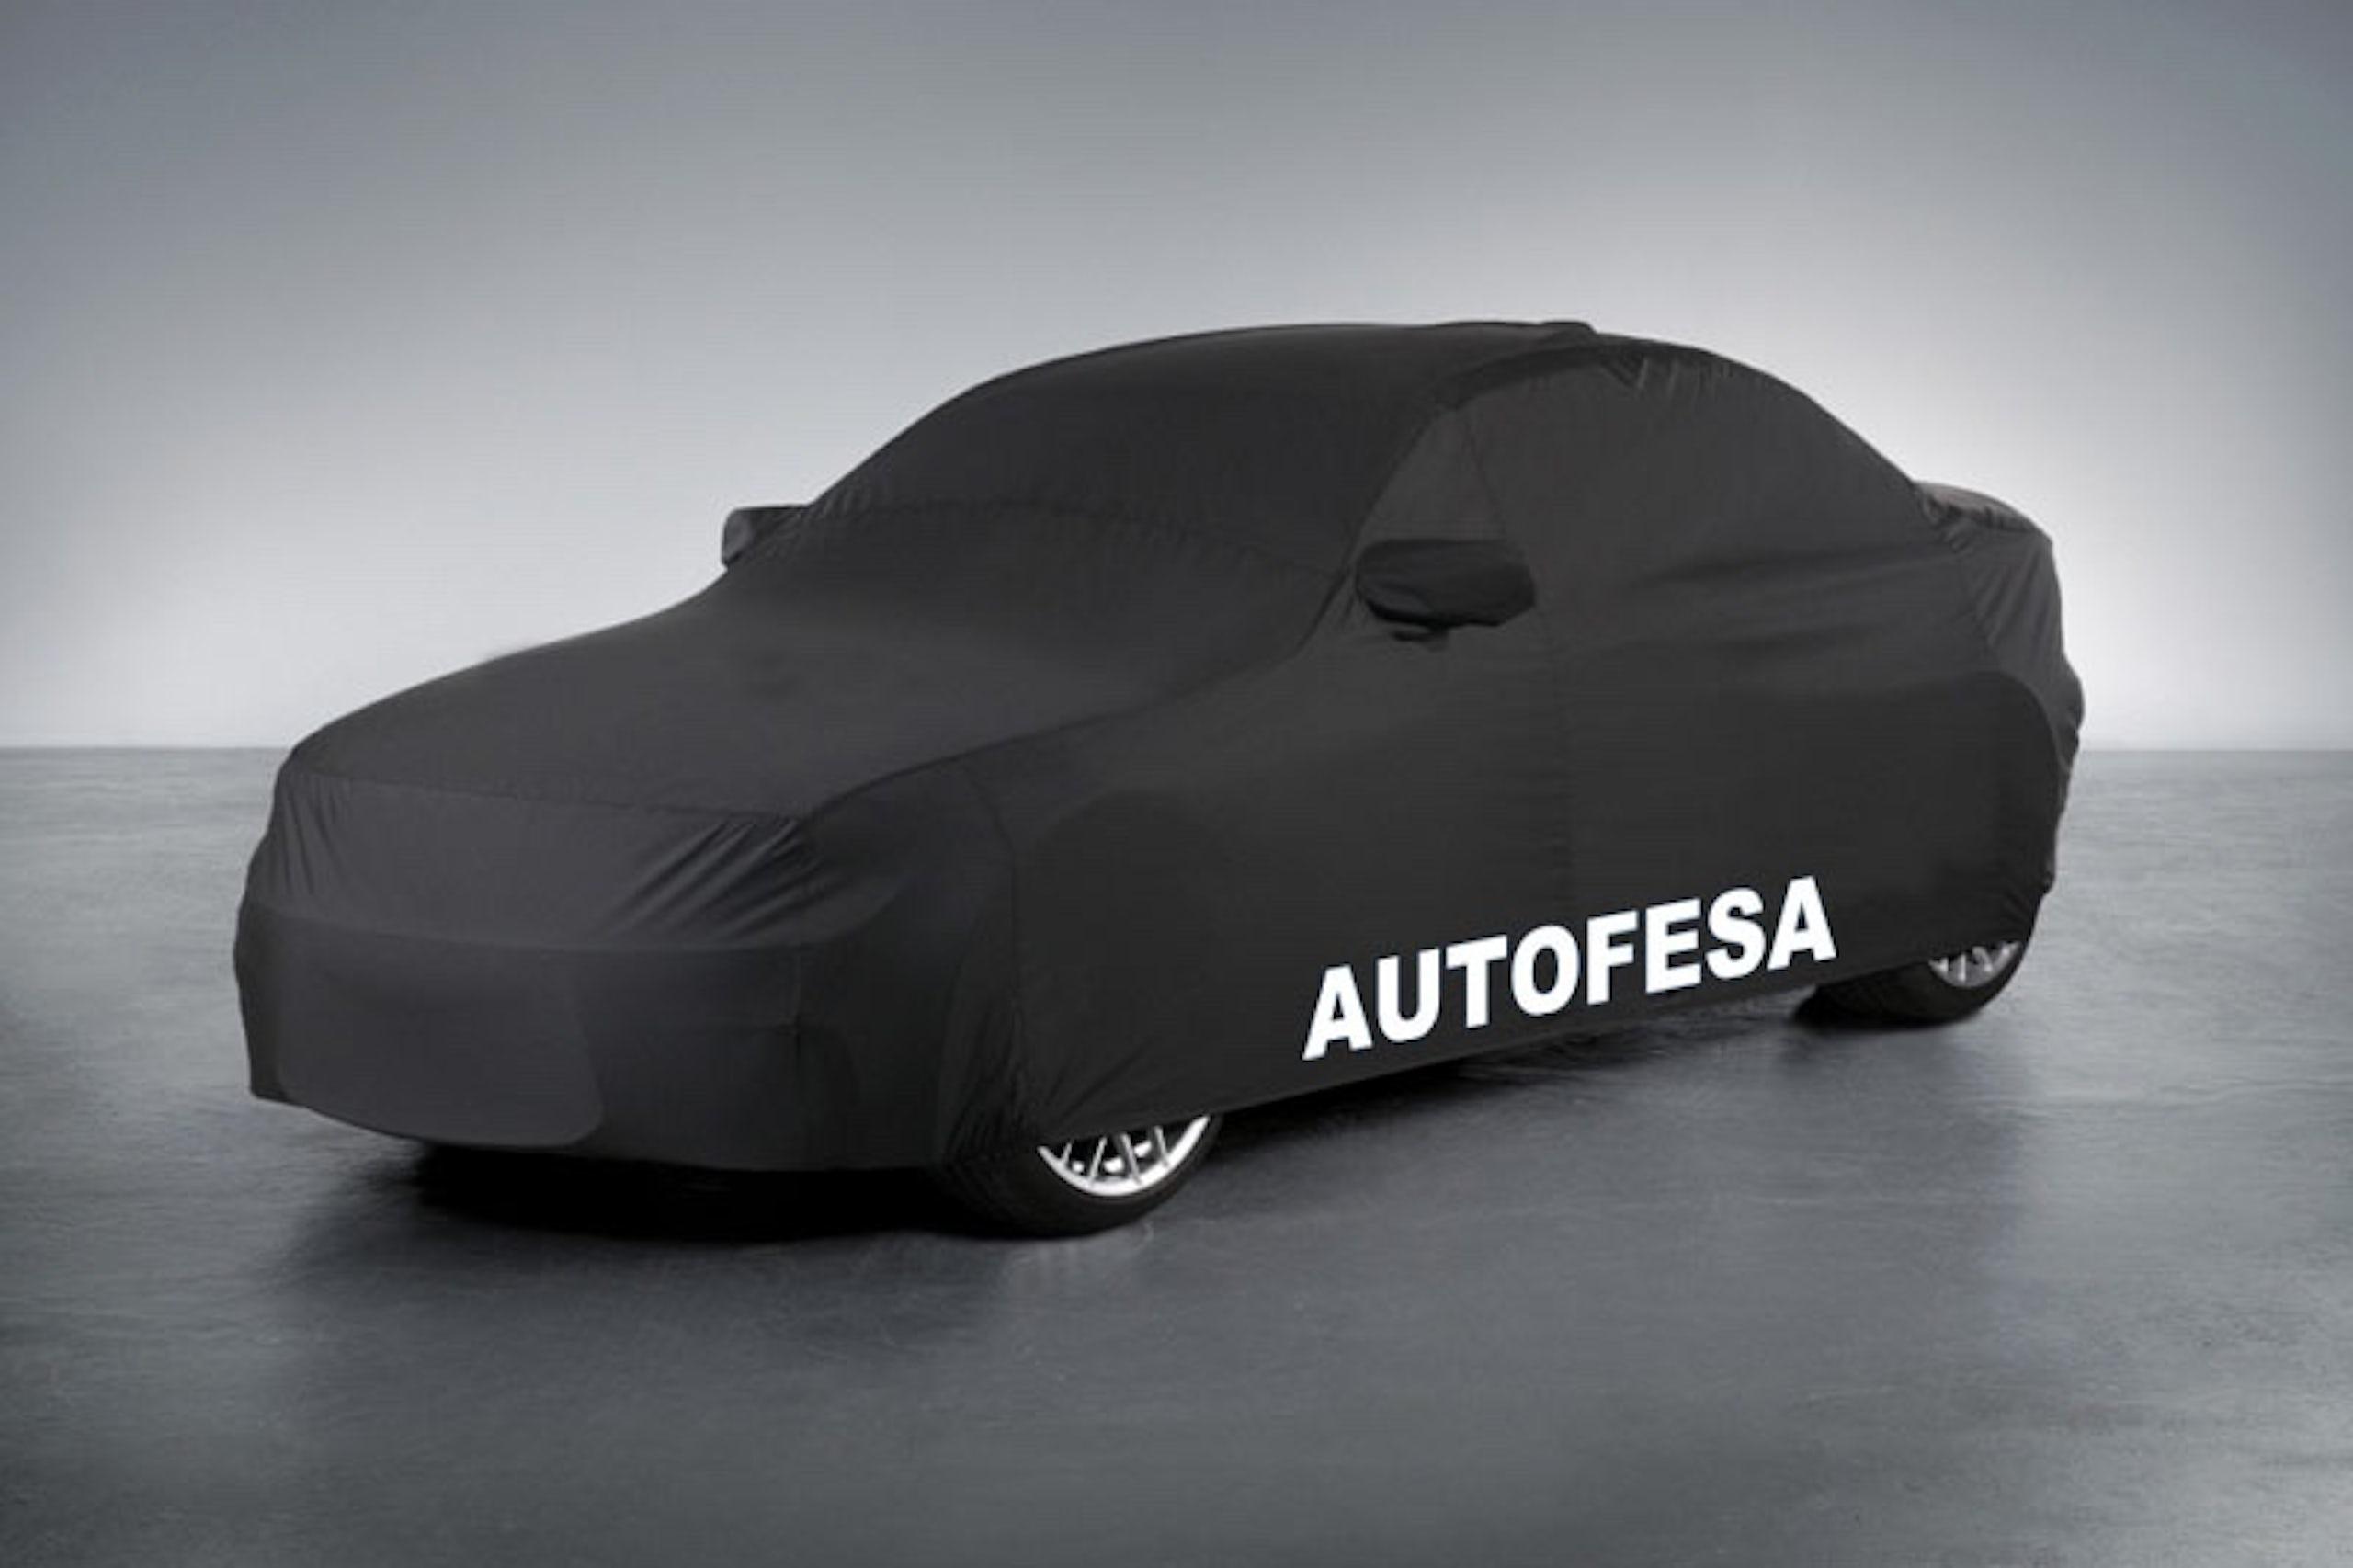 Mitsubishi Outlander 2.0 DI-D 150cv Motion 2WD 5p 7plz Auto S/S - Foto 7